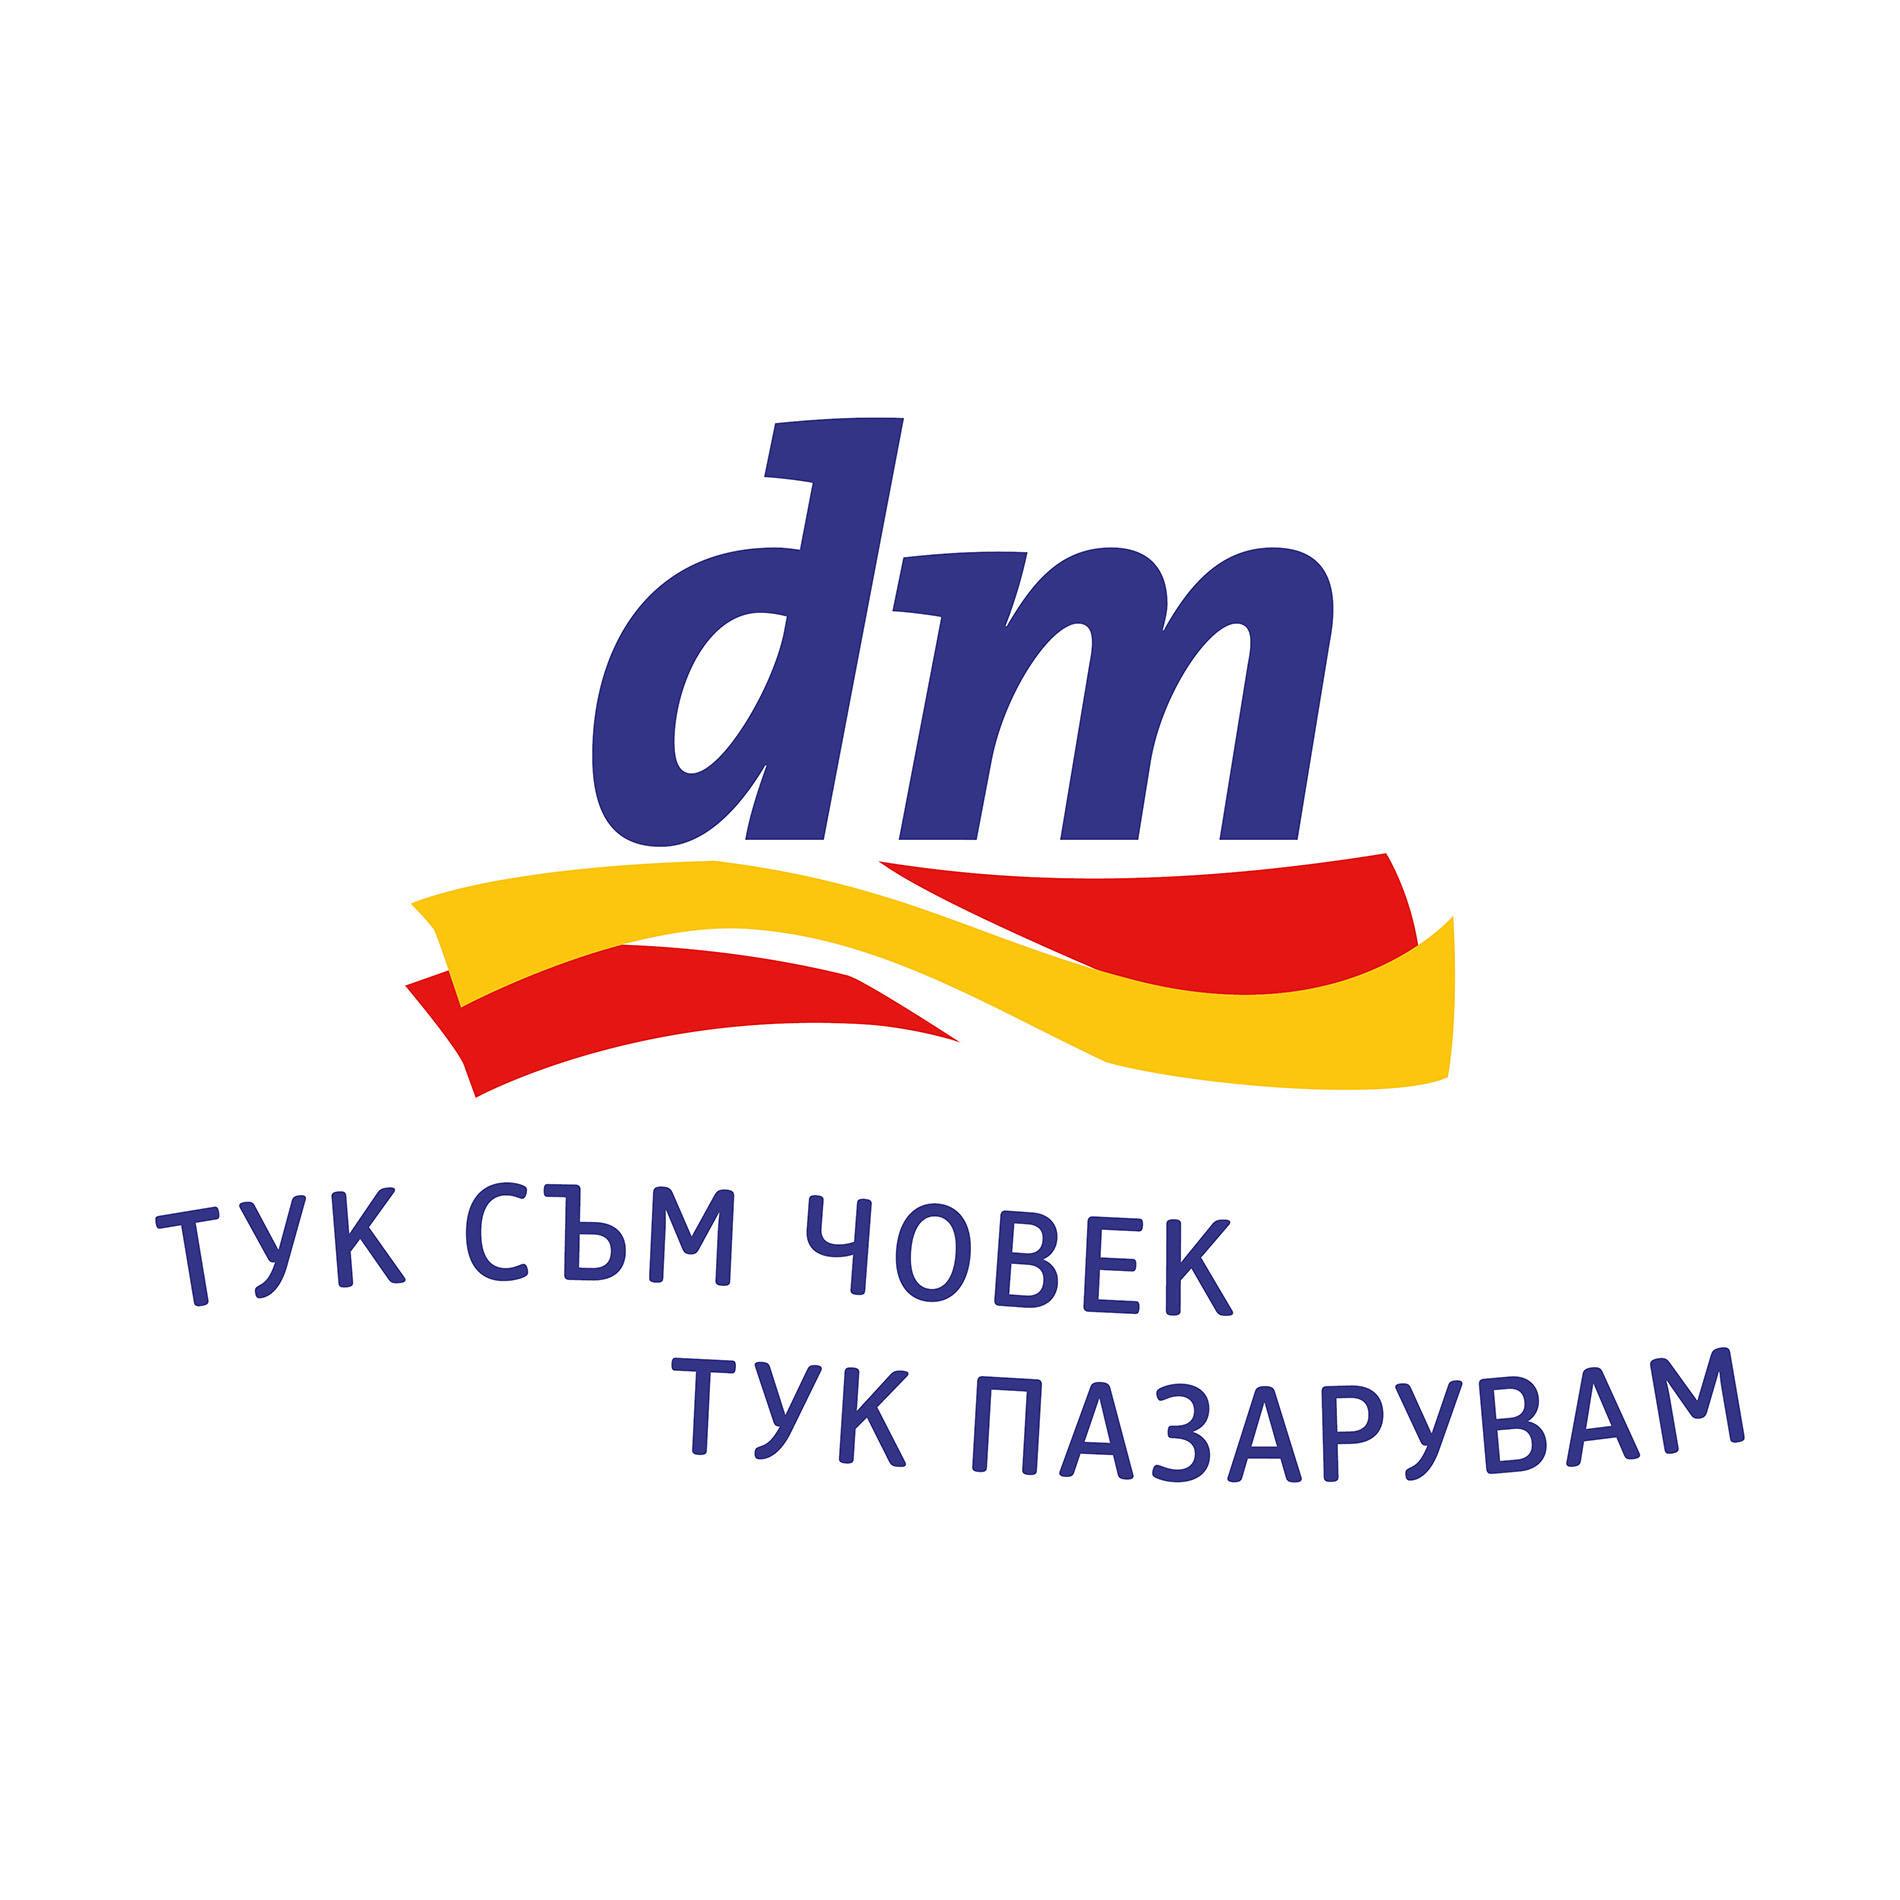 dm drogerie markt Bulgaria